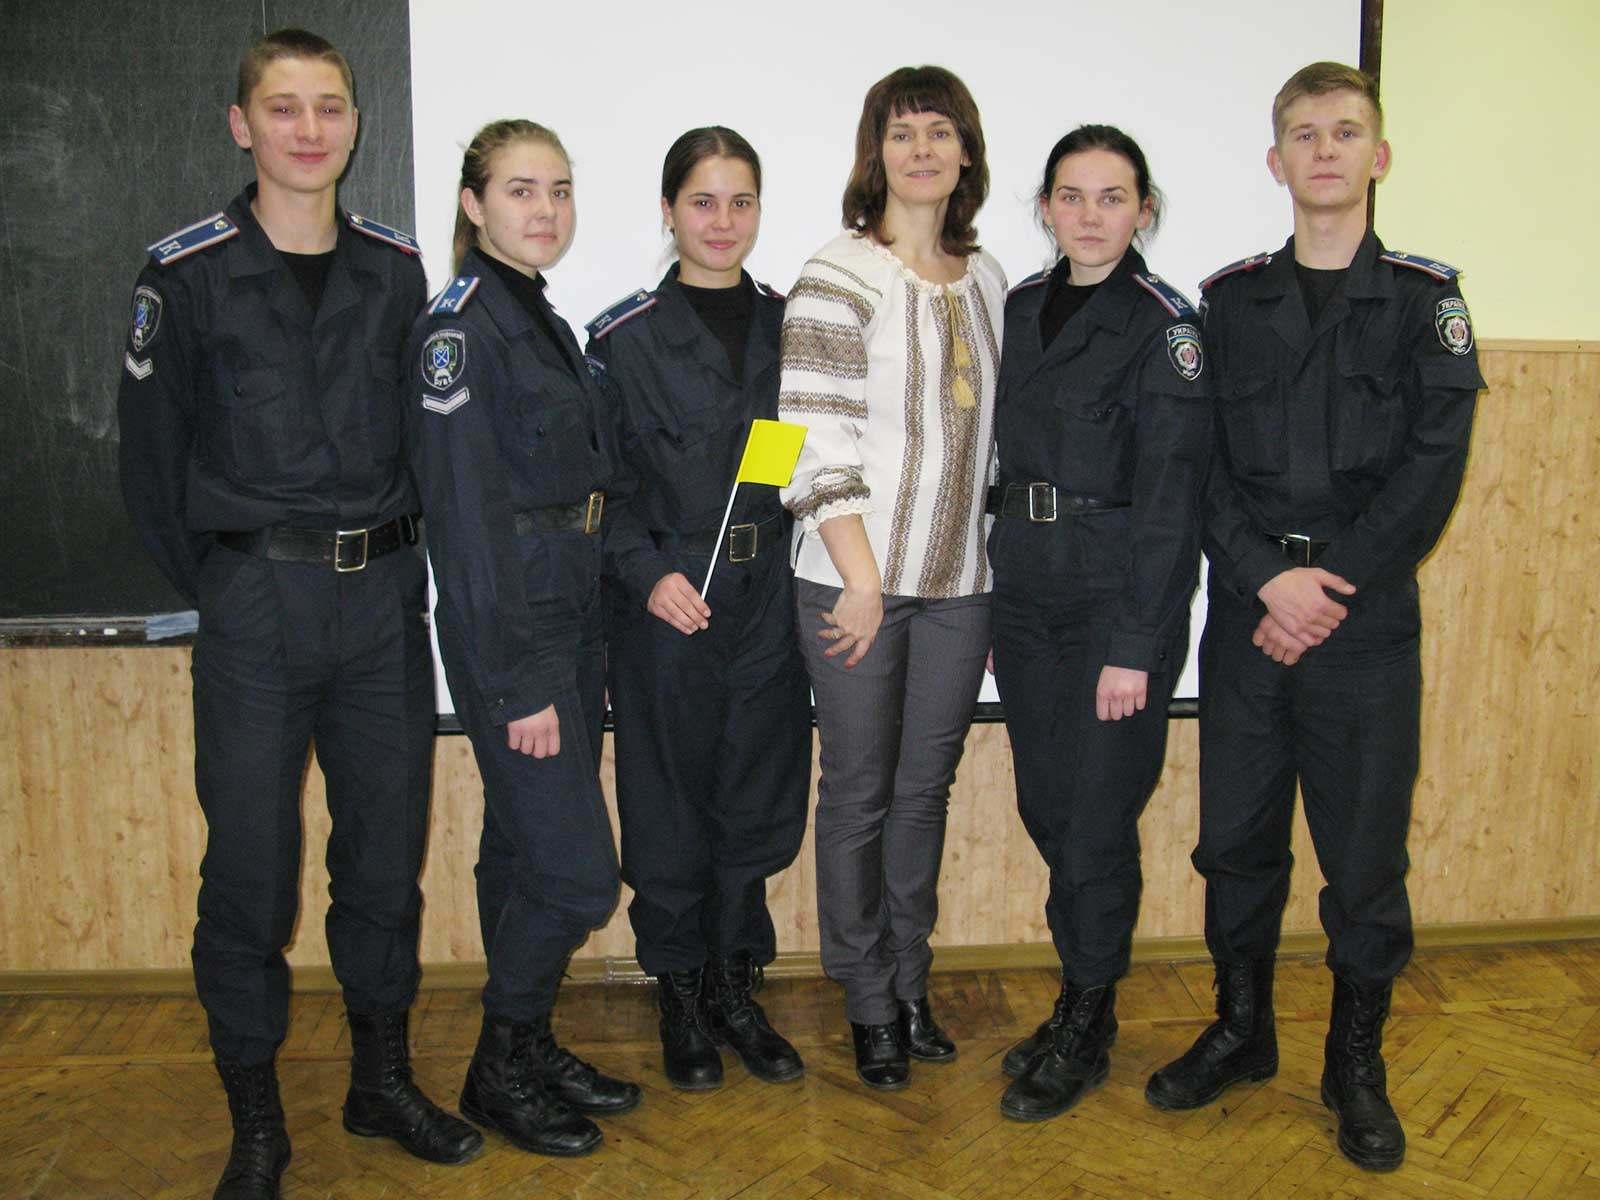 ДР-642: Тетяна Настич, Анастасія Пархоменко, Владислава Плескачова, Богдан Полупан